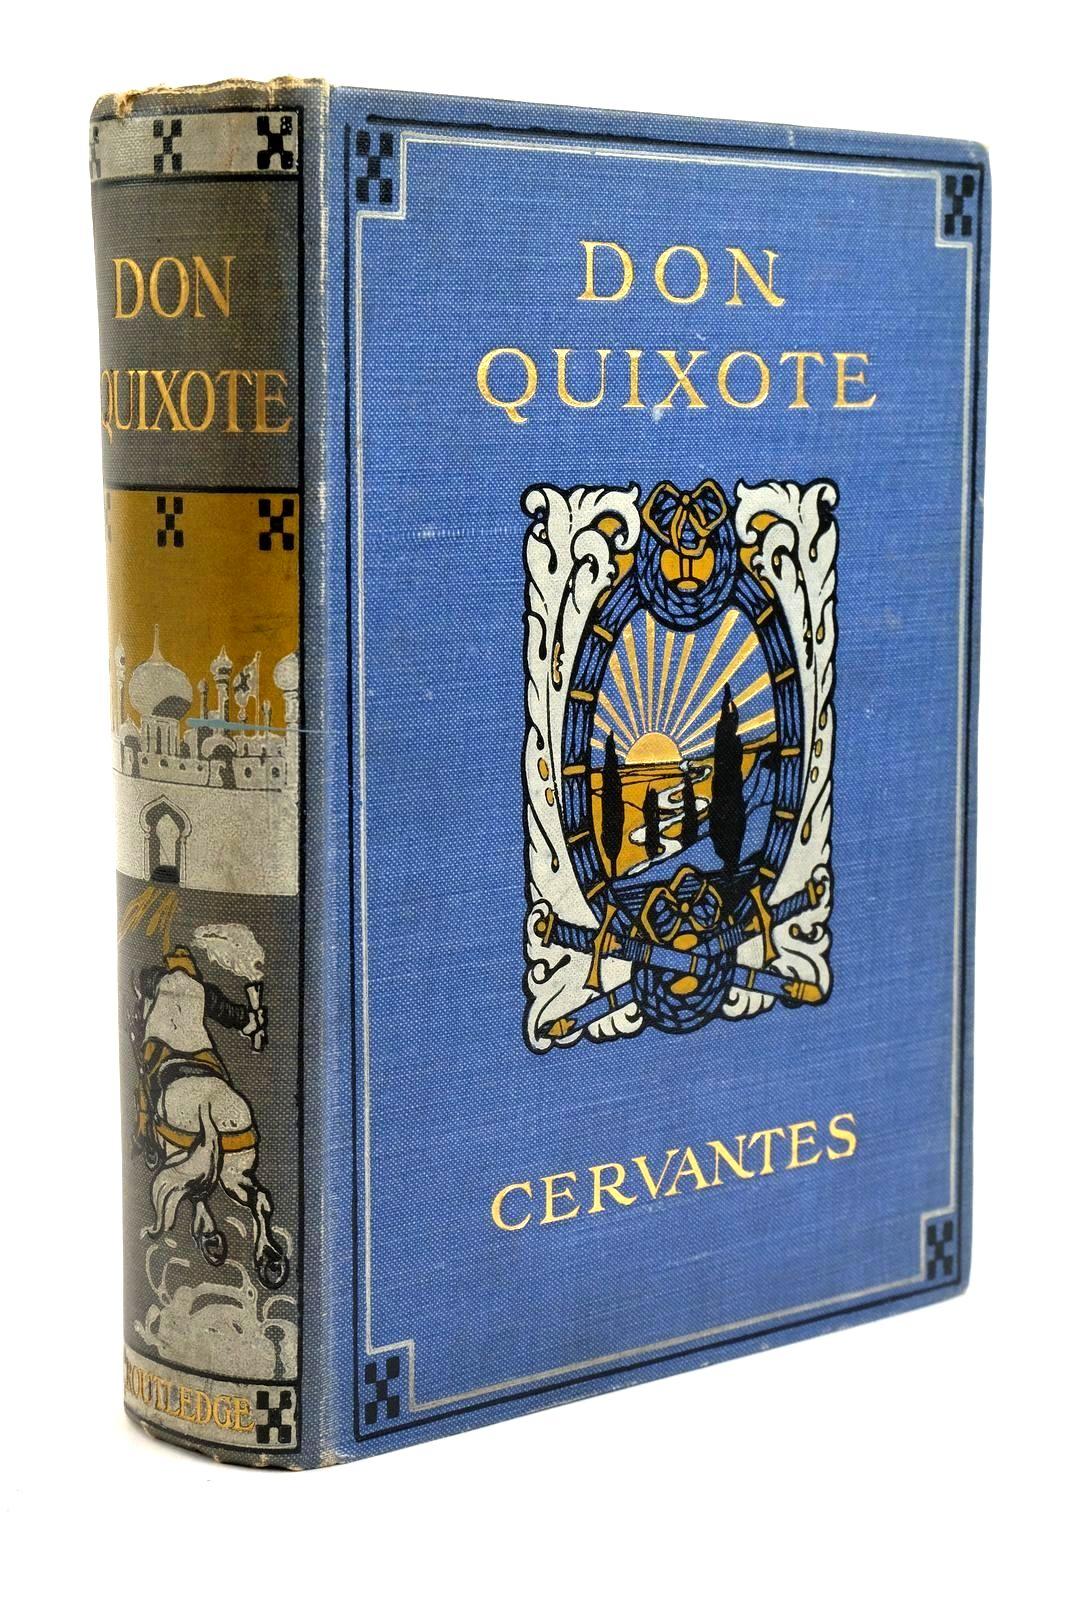 Photo of THE ADVENTURES OF DON QUIXOTE DE LA MANCHA- Stock Number: 1321788